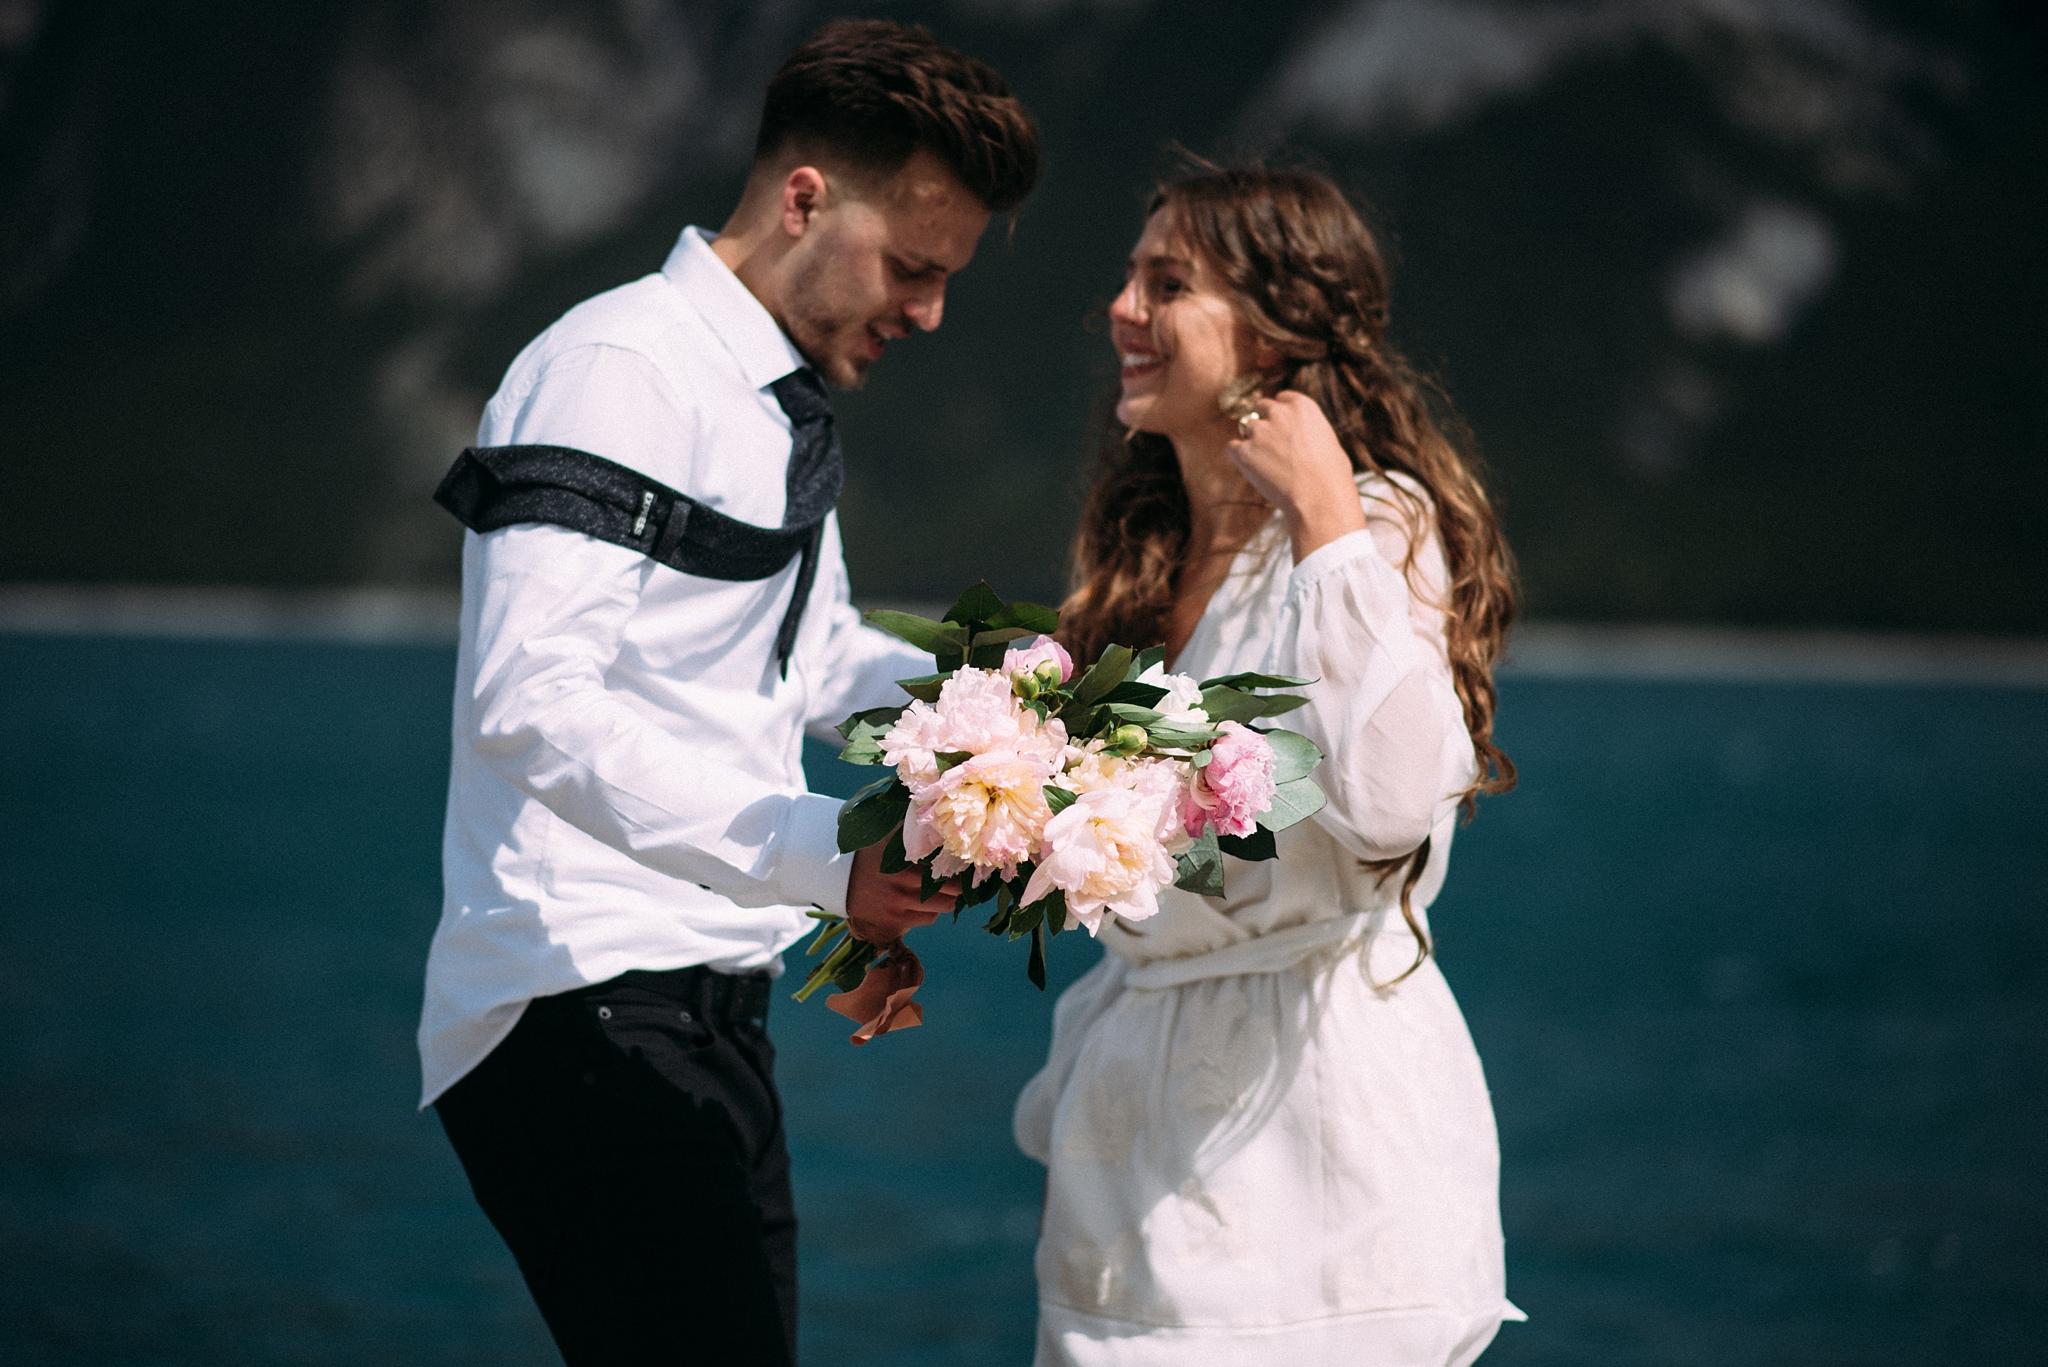 kaihla_tonai_intimate_wedding_elopement_photographer_4103